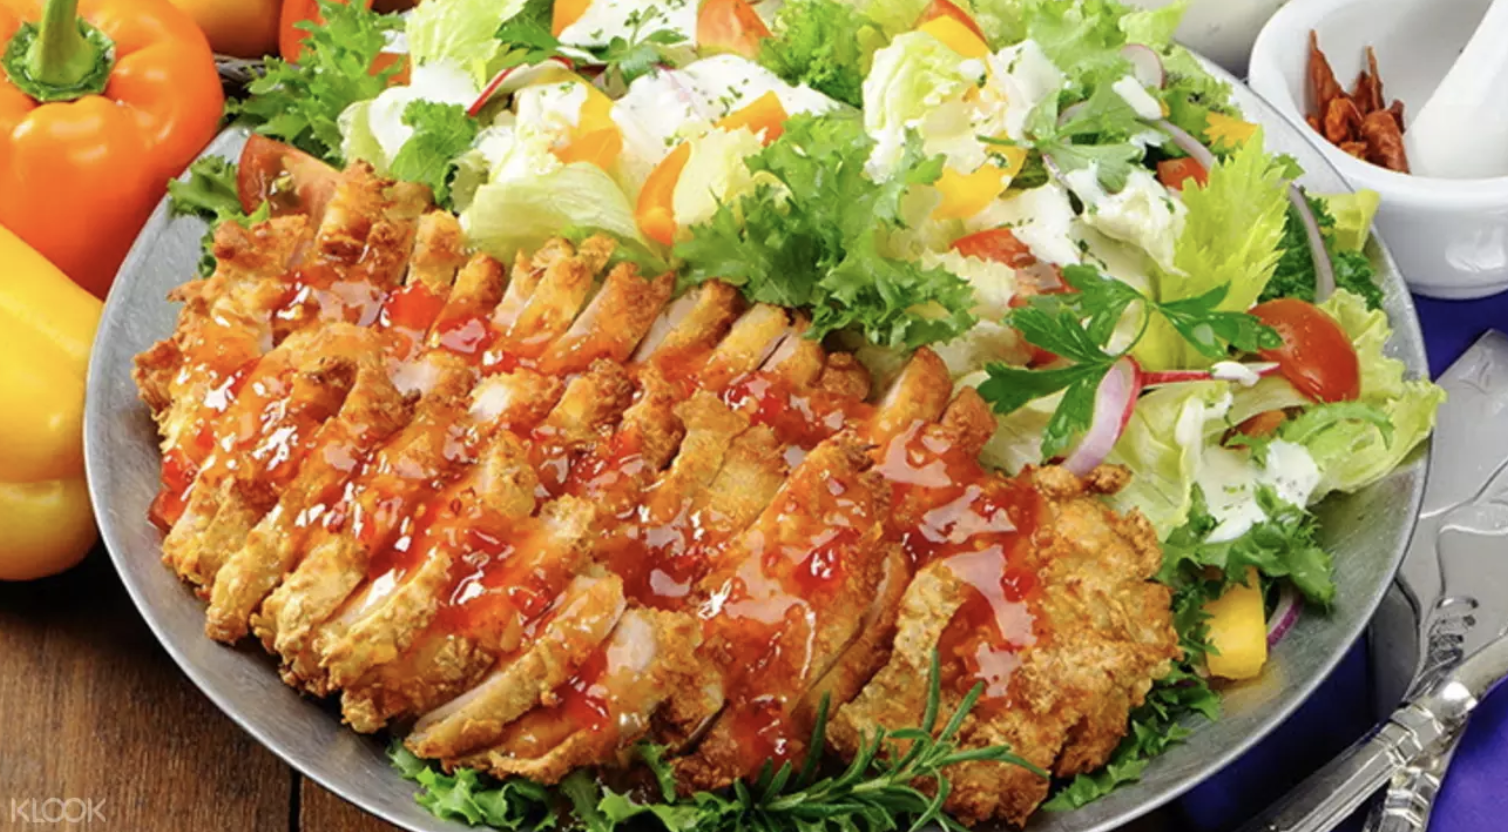 korean fried chicken restaurant seoul